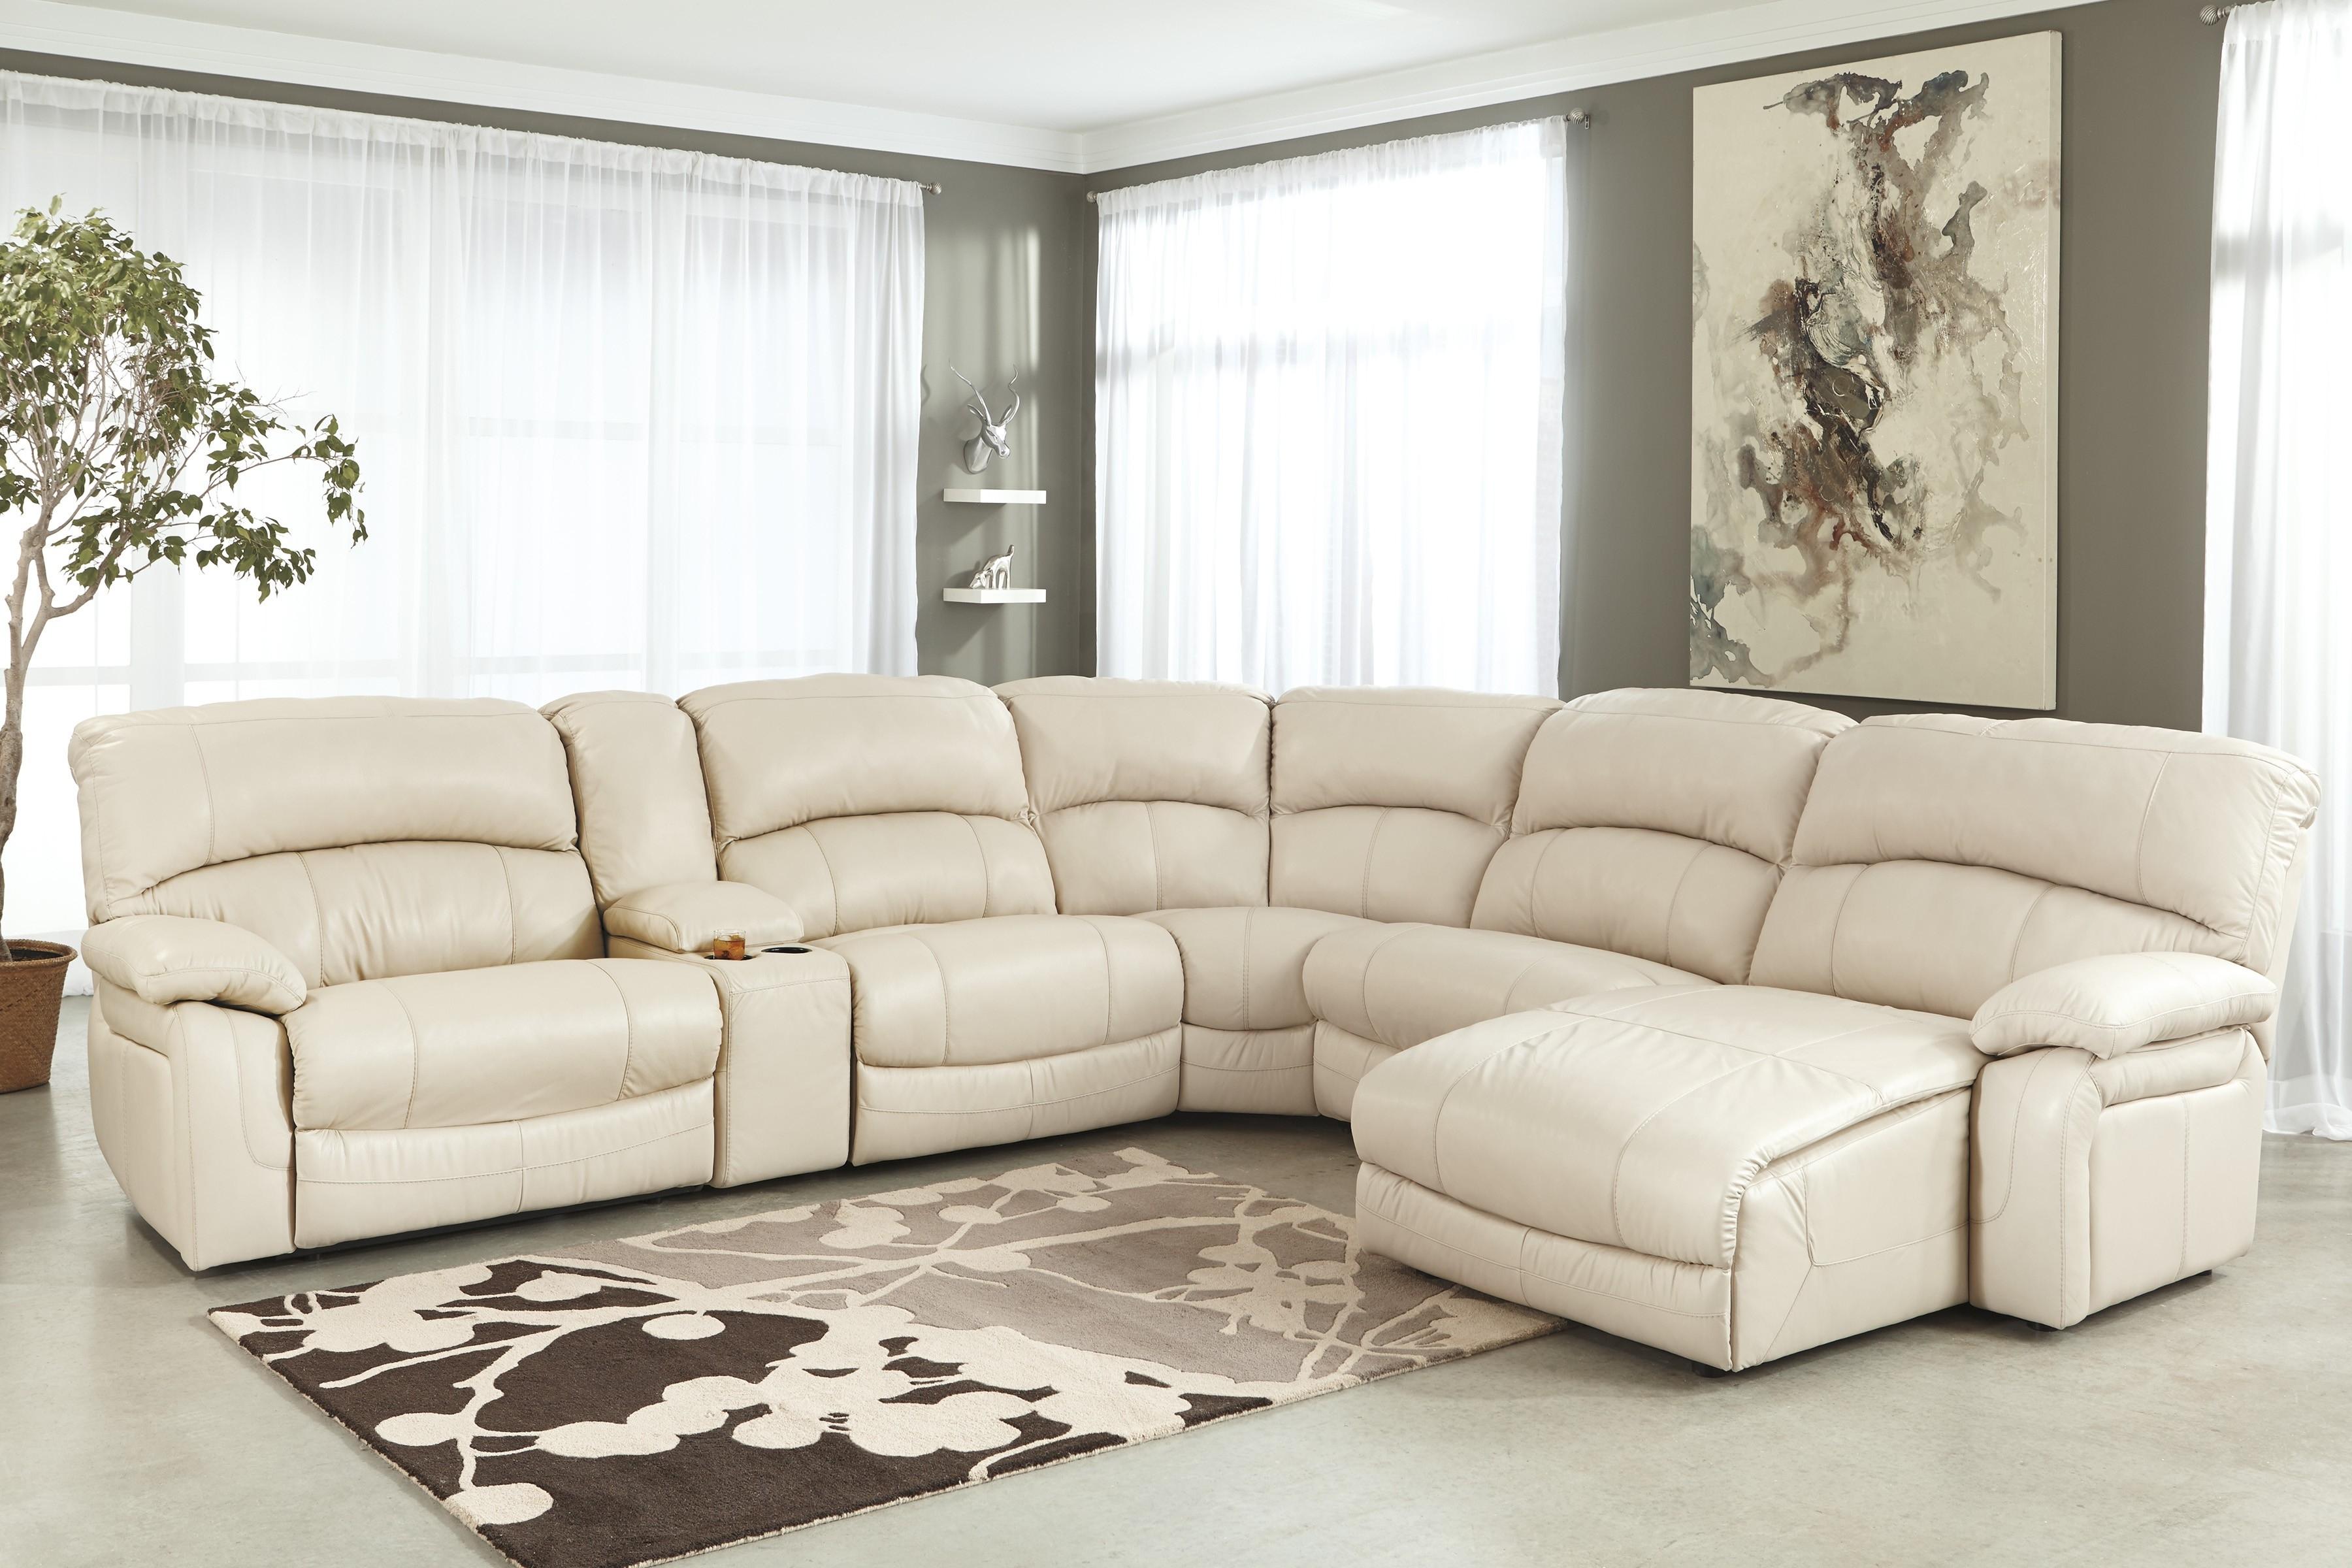 U Shaped Leather Sectional Sofa – 28 Images – Leather Sectional Sofa Intended For U Shaped Leather Sectional Sofas (Photo 2 of 10)